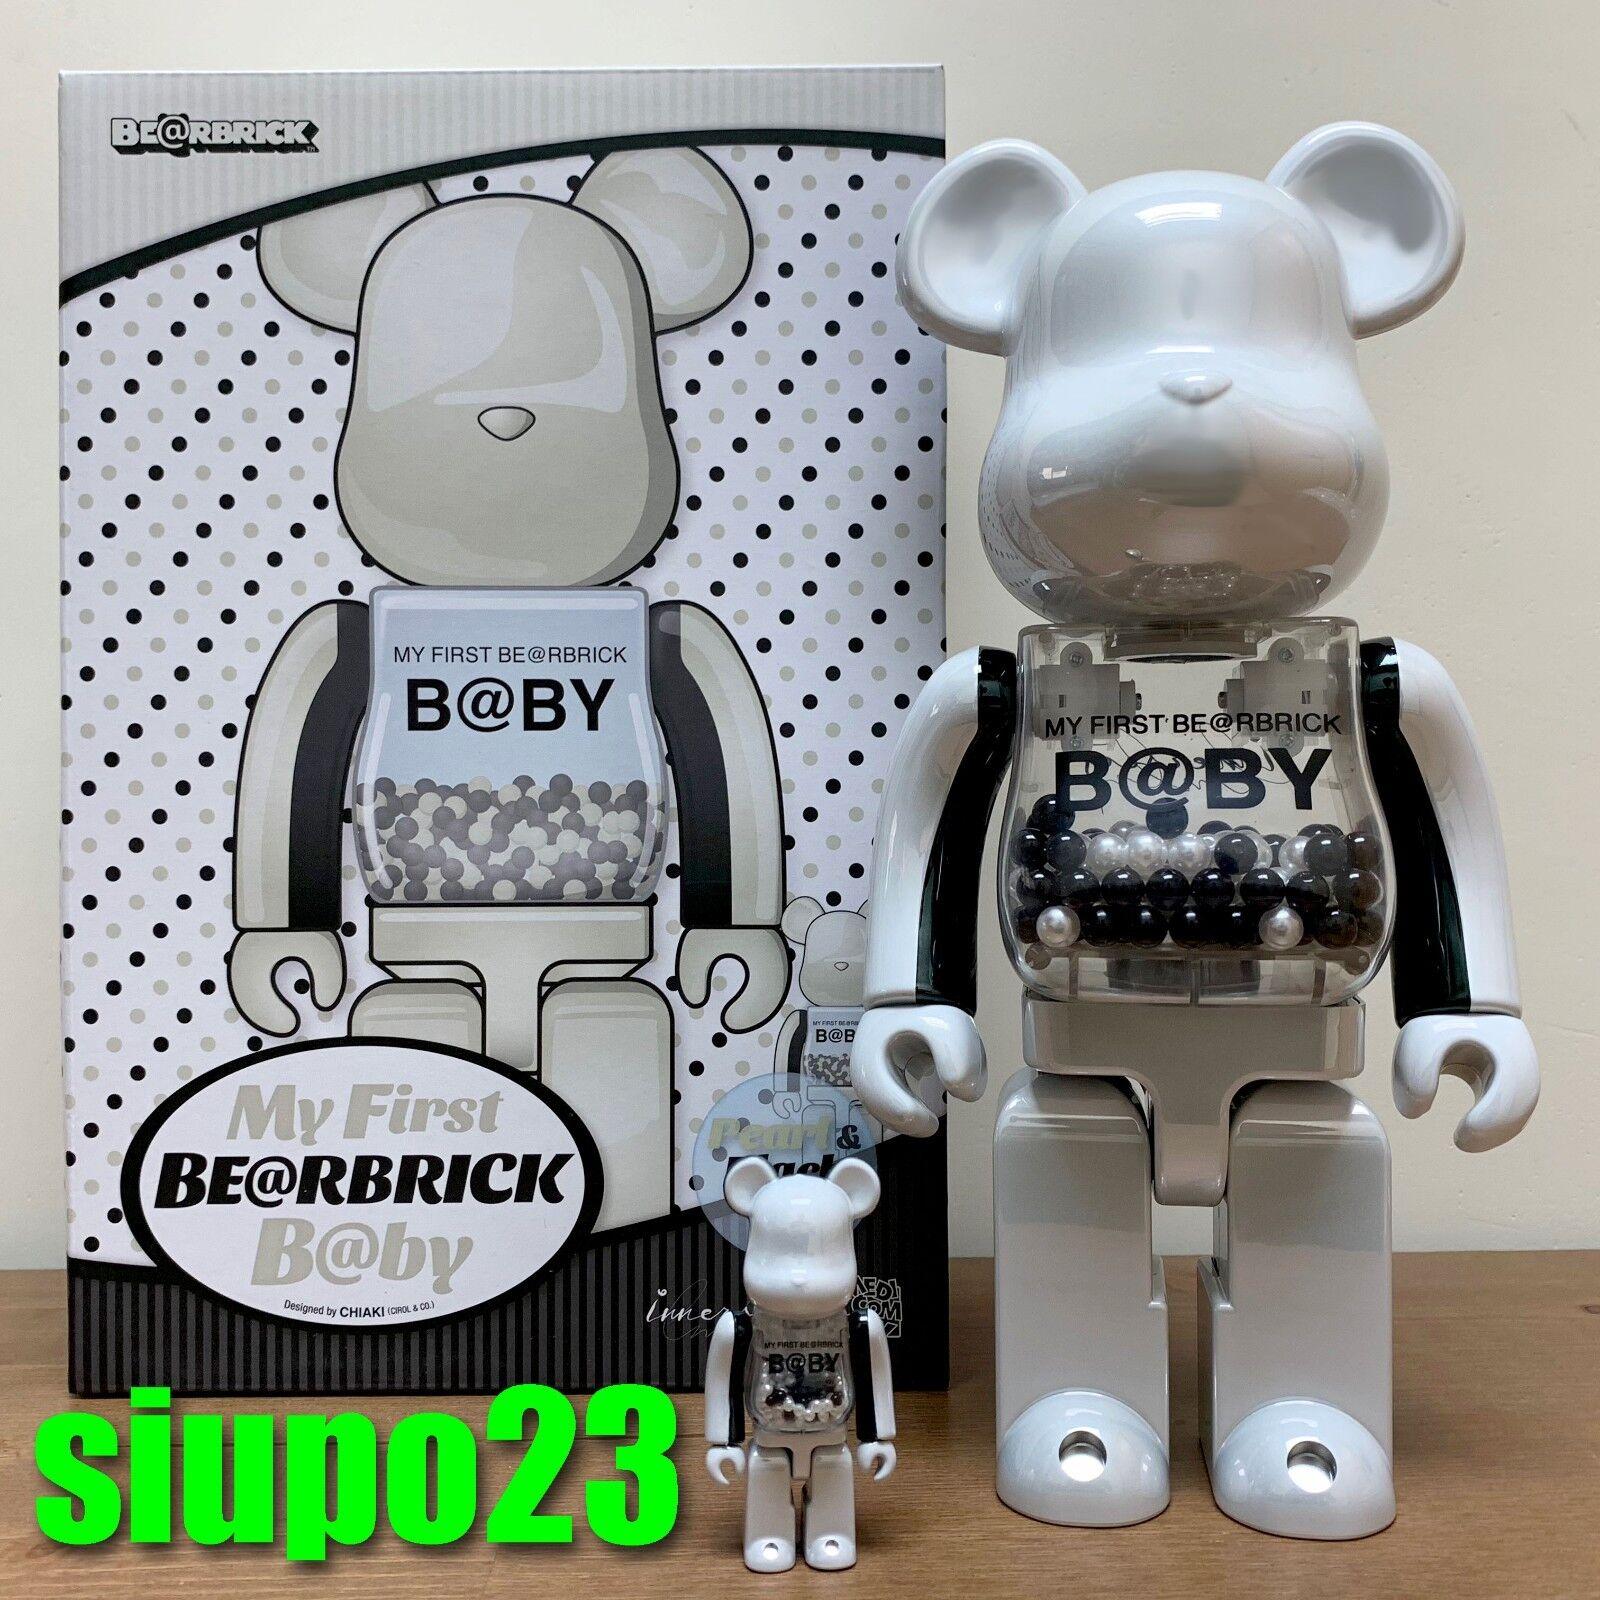 Medicom 400% + 100% Bearbrick  mi primer bebé Be@rbrick Perla blancoo y Negro Ver